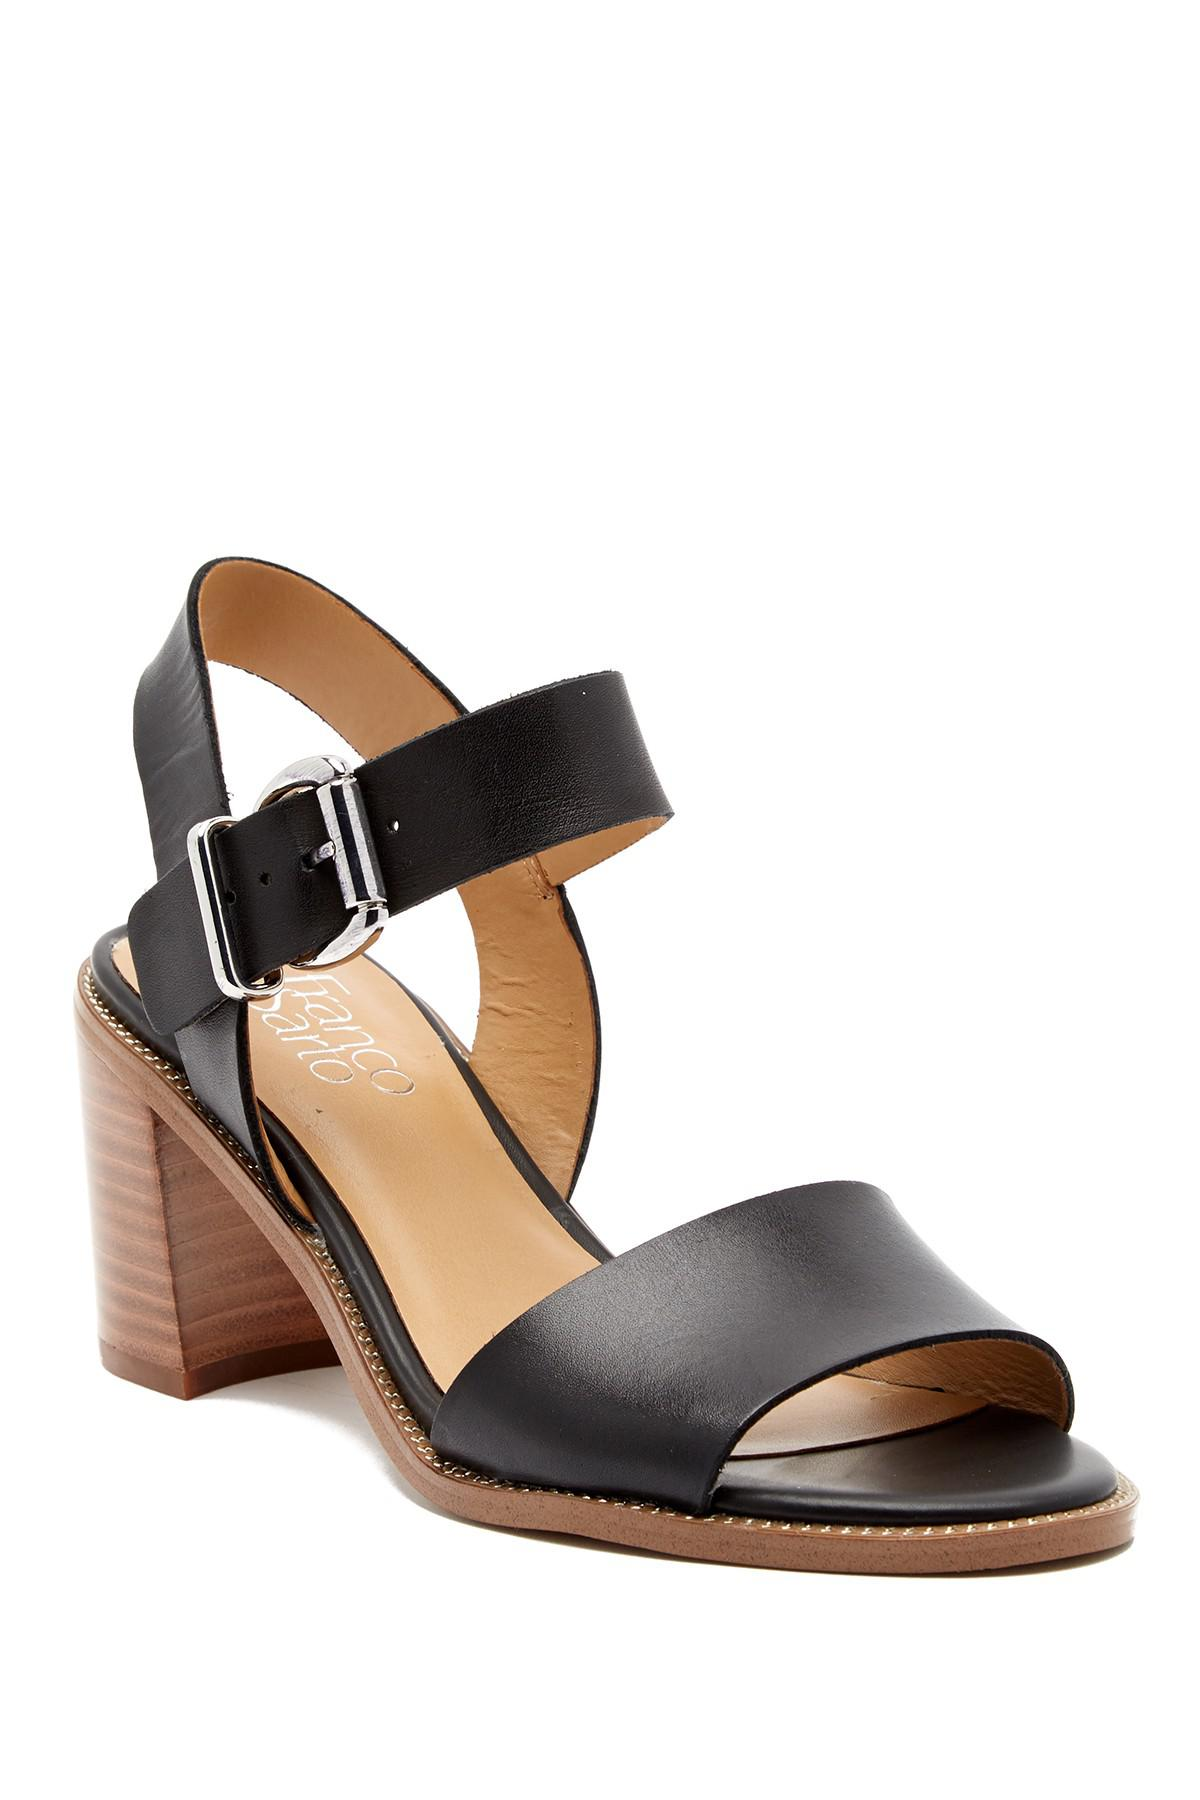 9b0ae5c6d2fc Lyst - Franco Sarto Harlie Ankle Strap Leather Sandal in Black